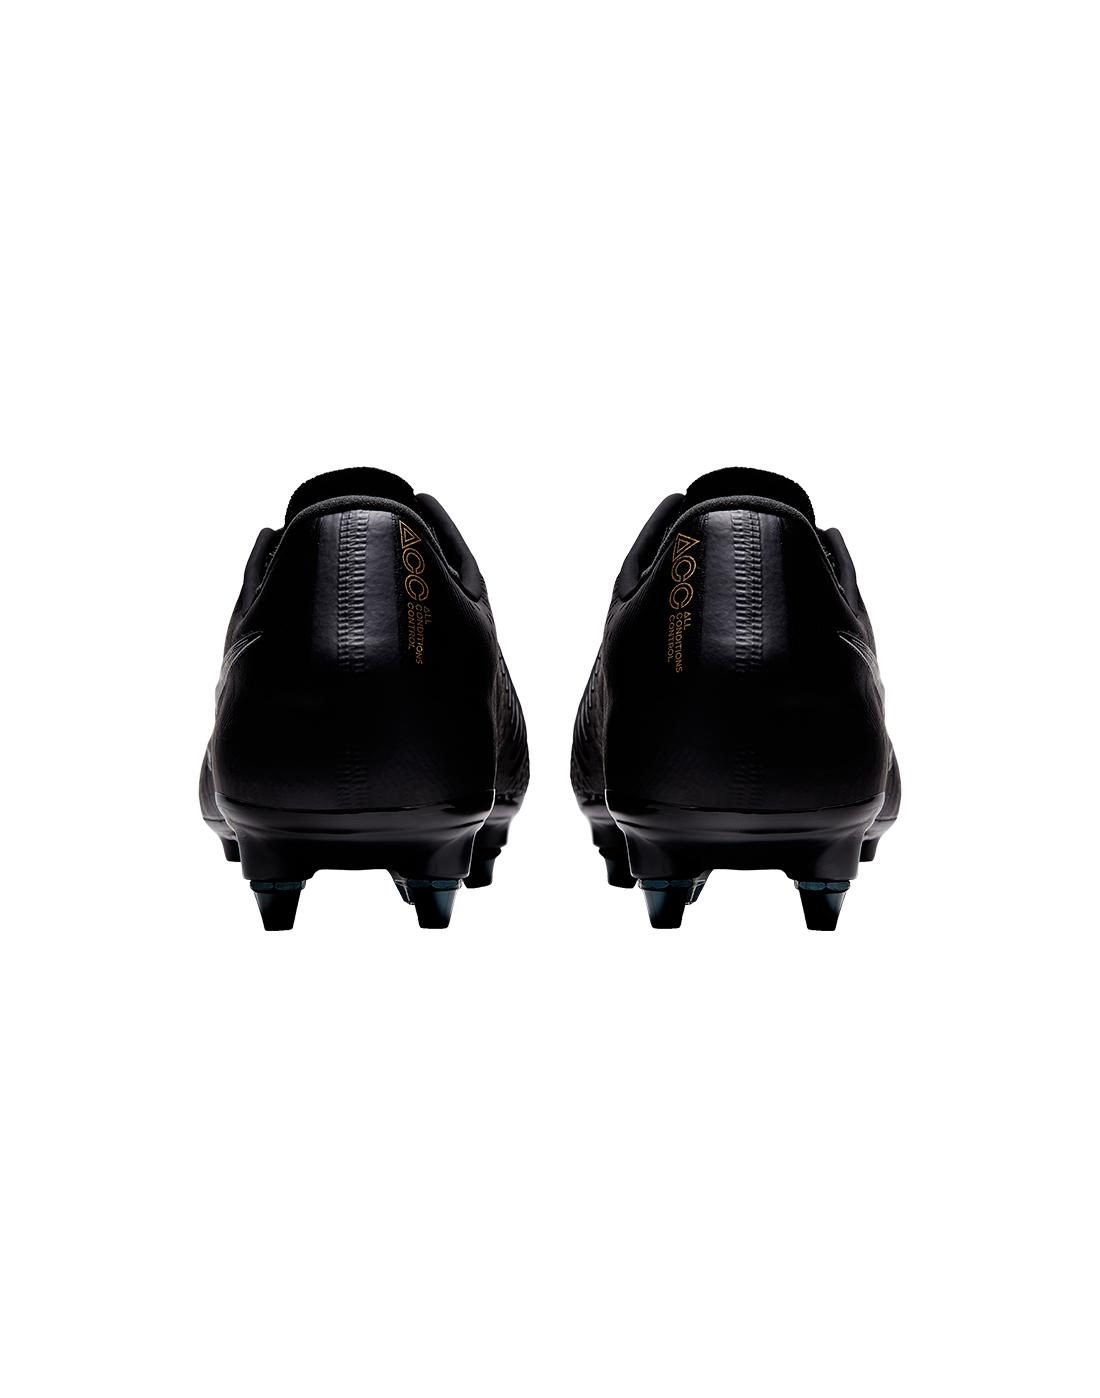 e822b4f11 Black   Gold Nike Phantom Venom Elite